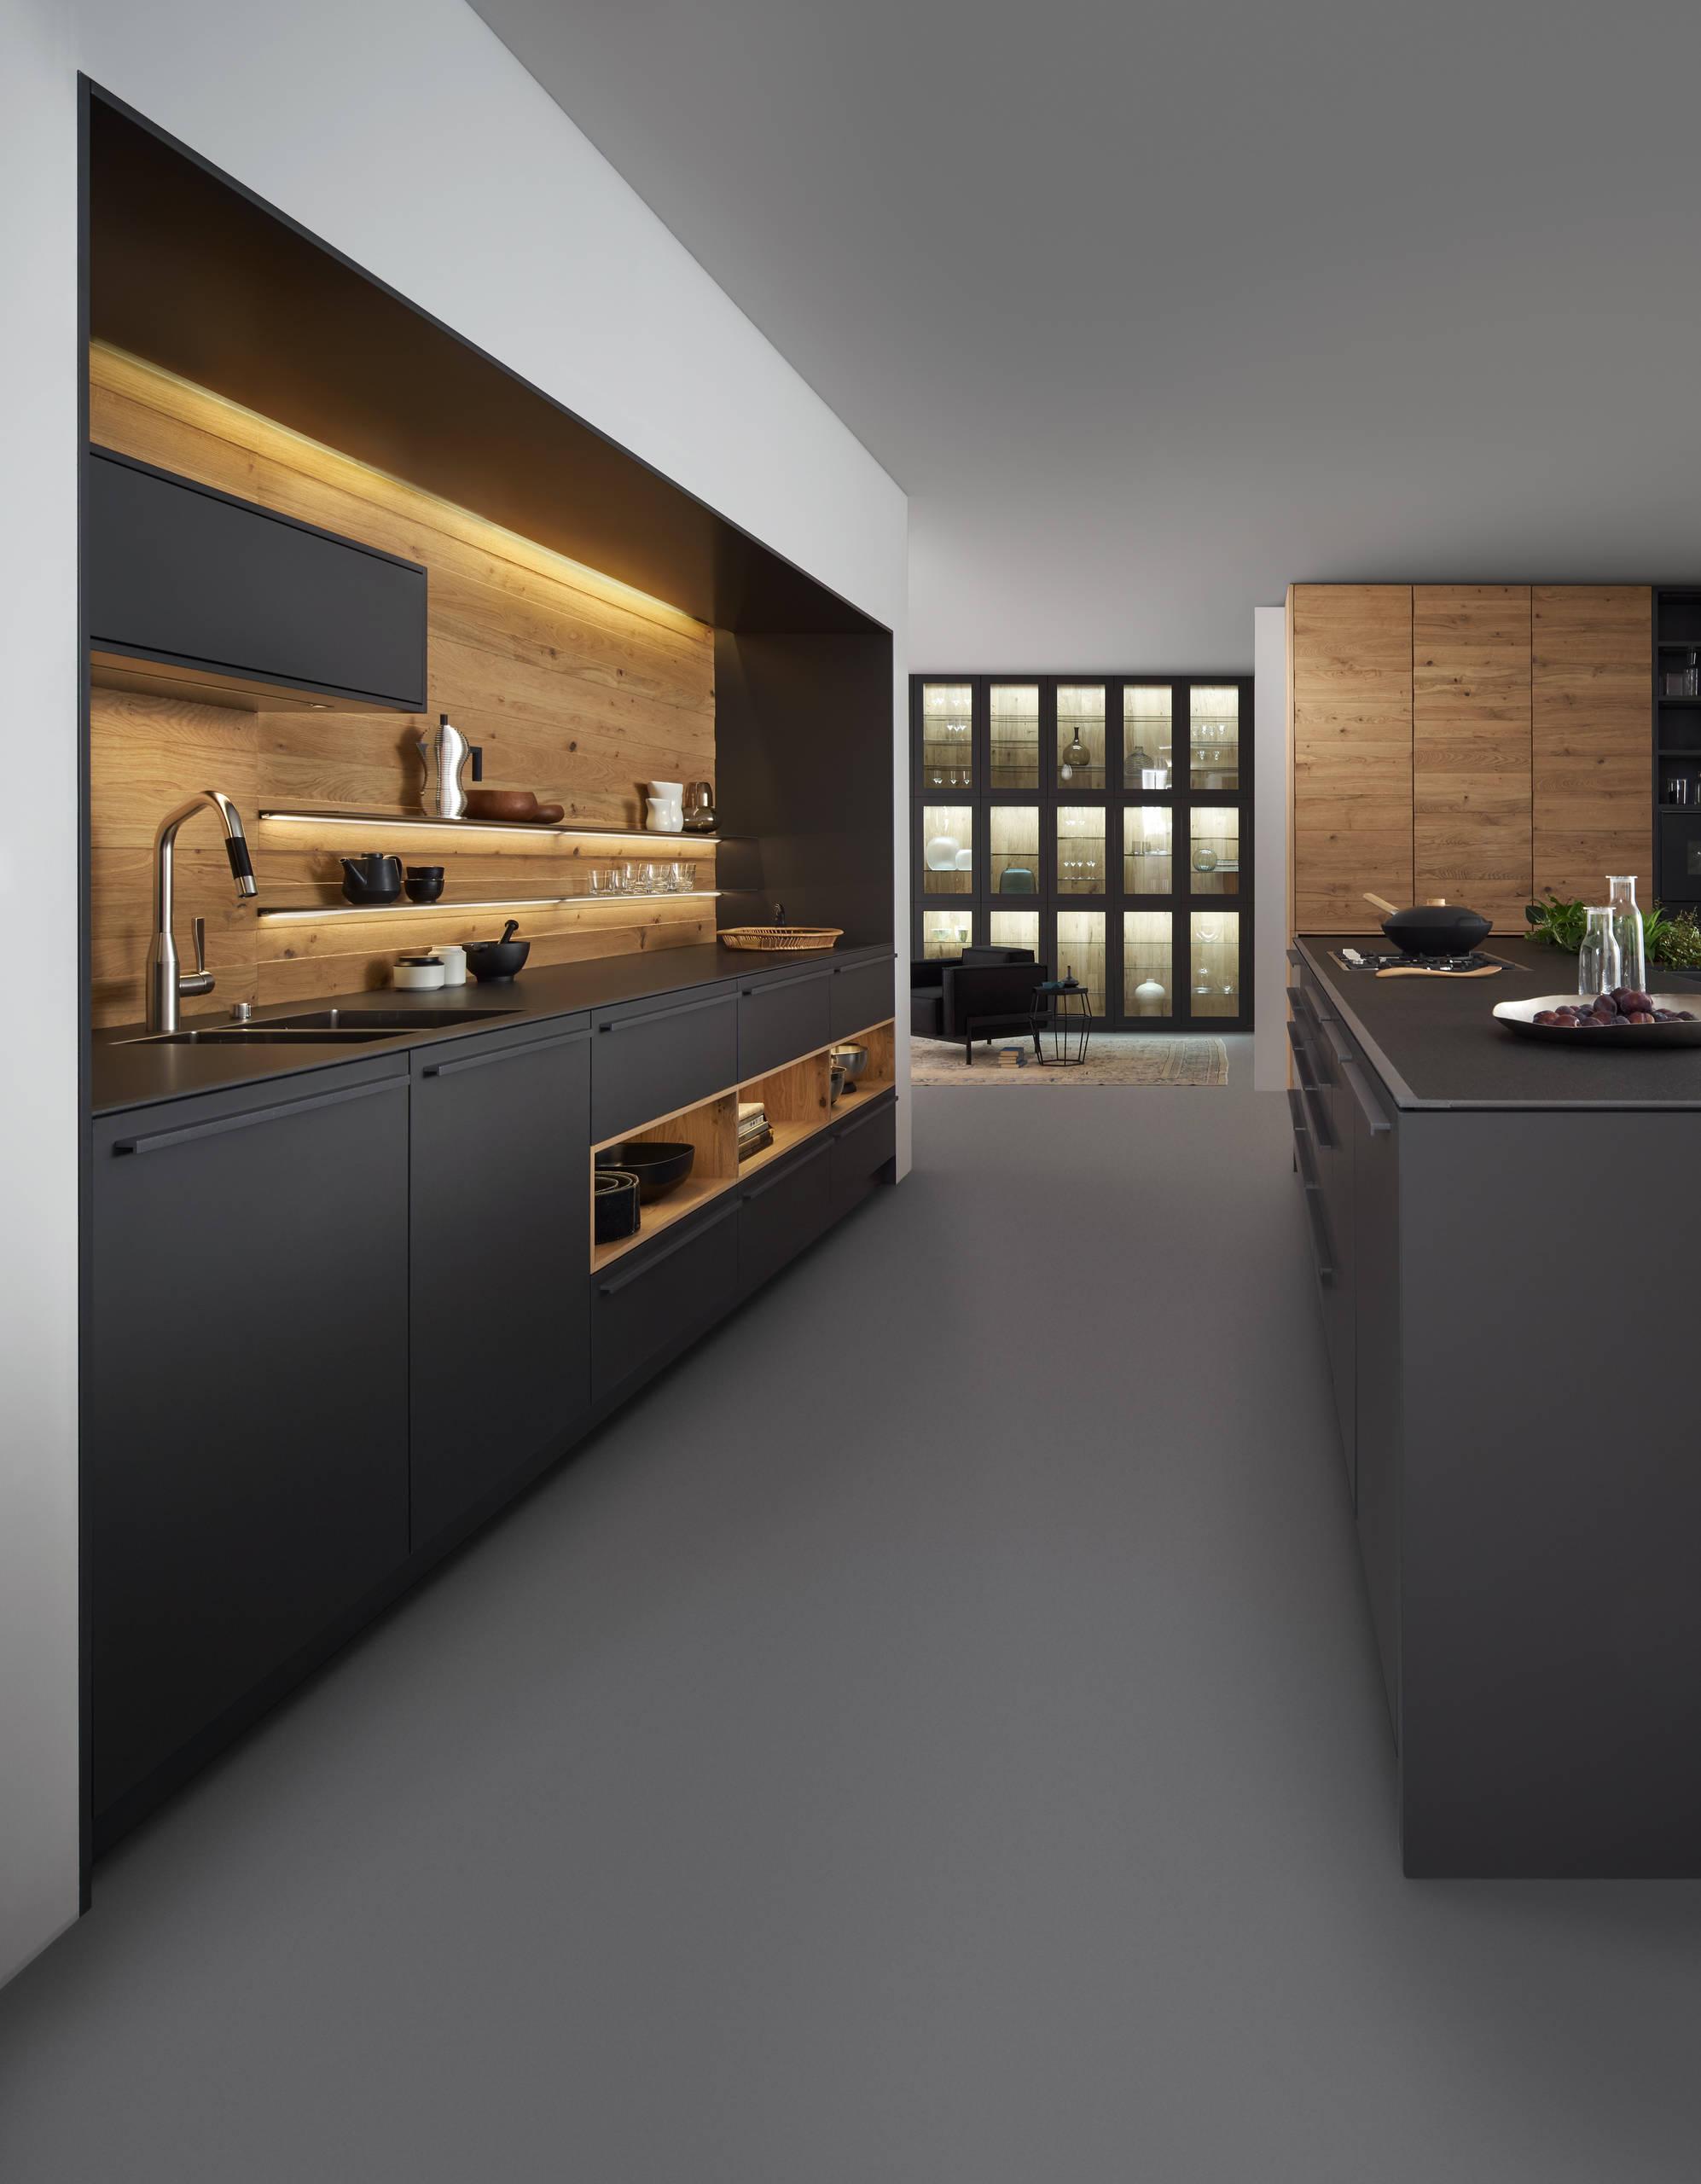 75 Beautiful Galley Kitchen Pictures Ideas November 2020 Houzz